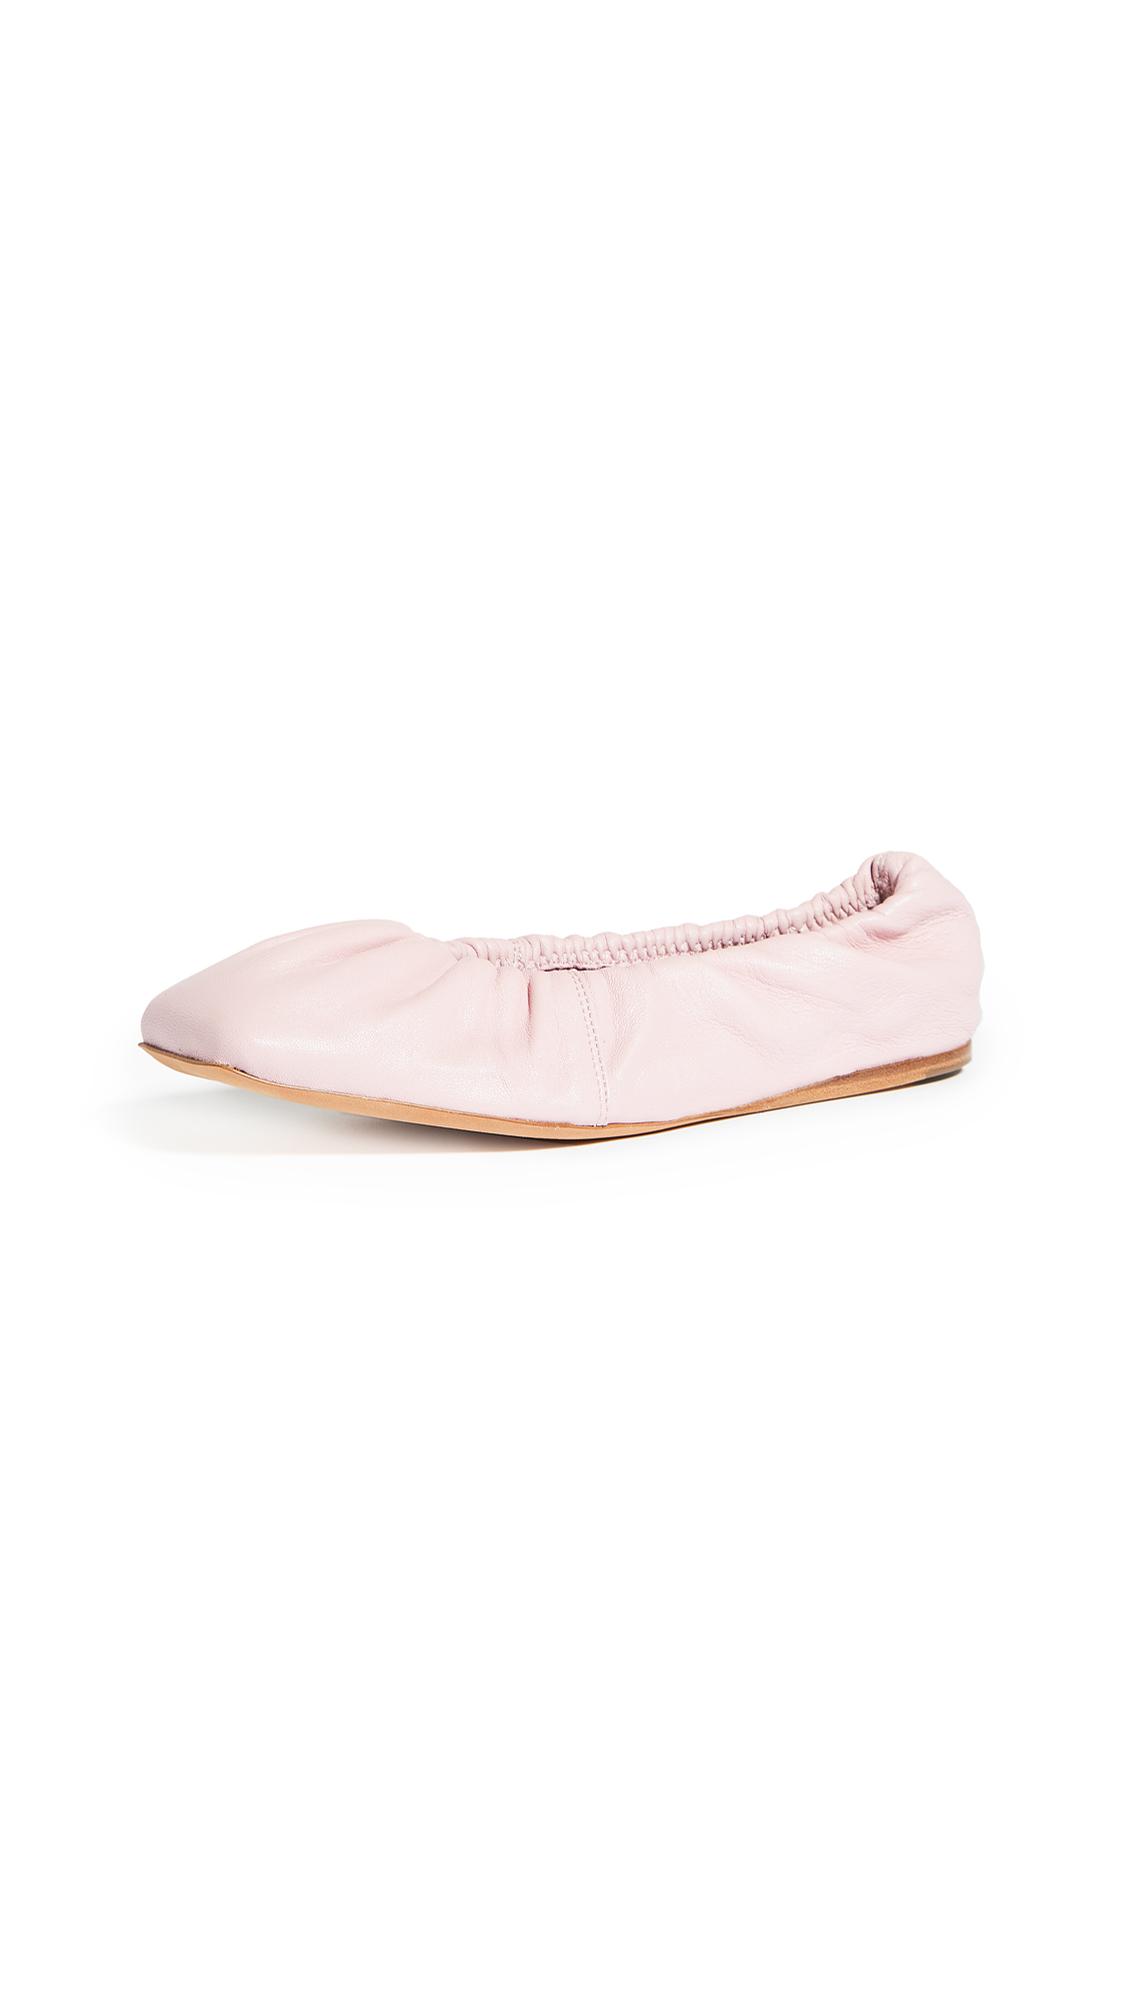 GANNI Square Toe Ballet Flats